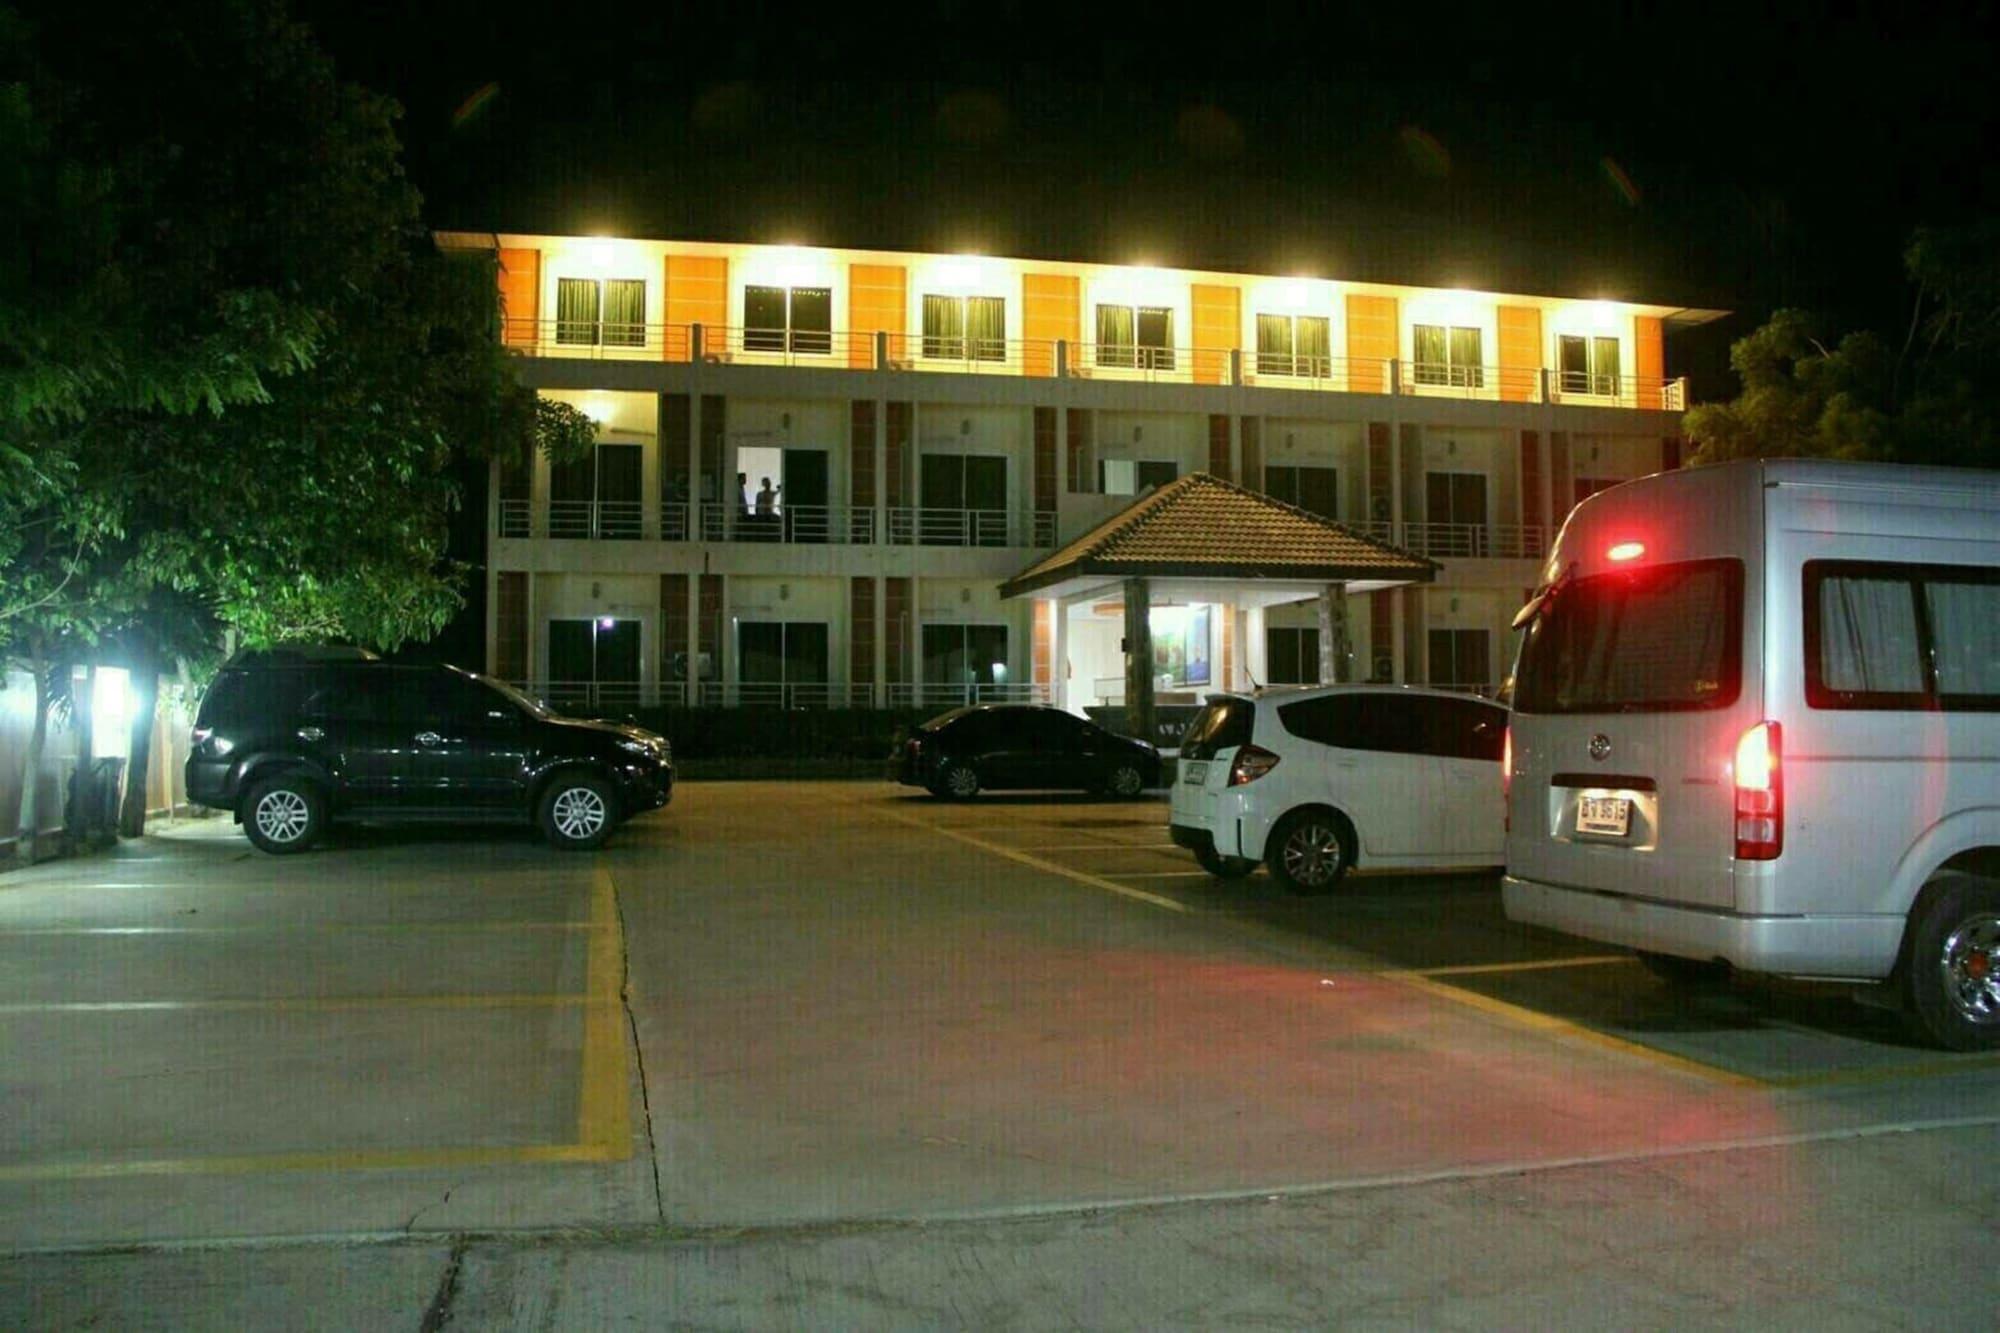 Sakaeogarden Hotel, Muang Sa Kaeo